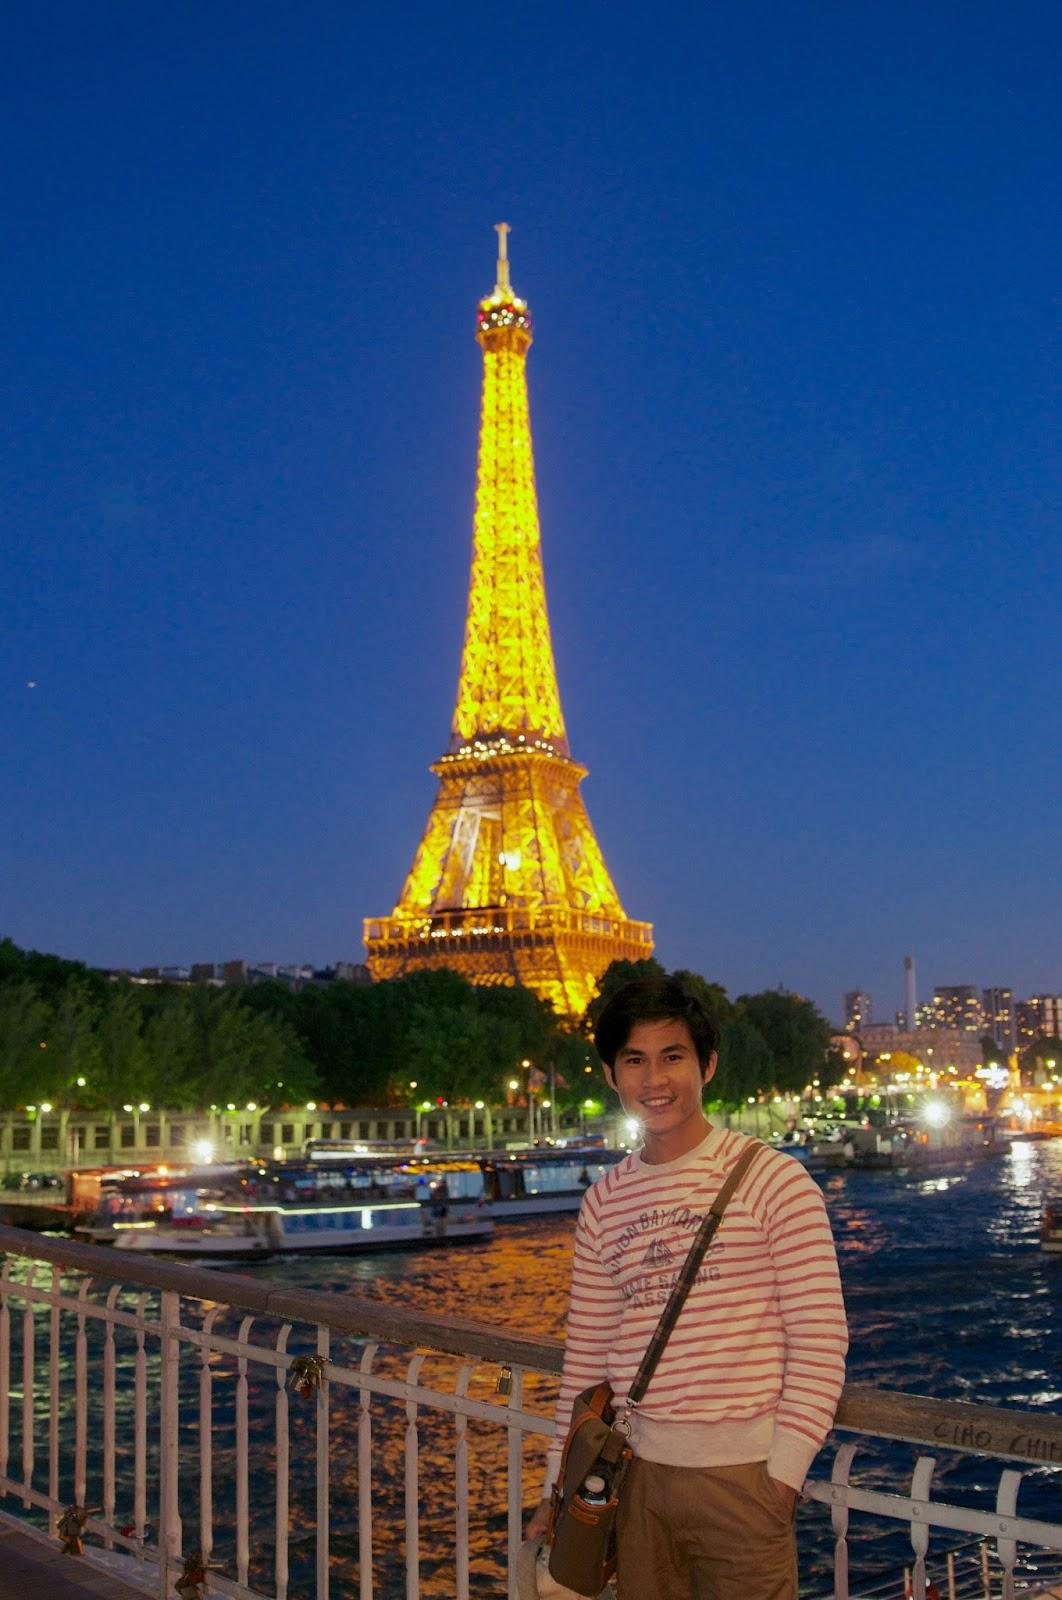 paris perancis travelling eiffel menara tower tempat wisata